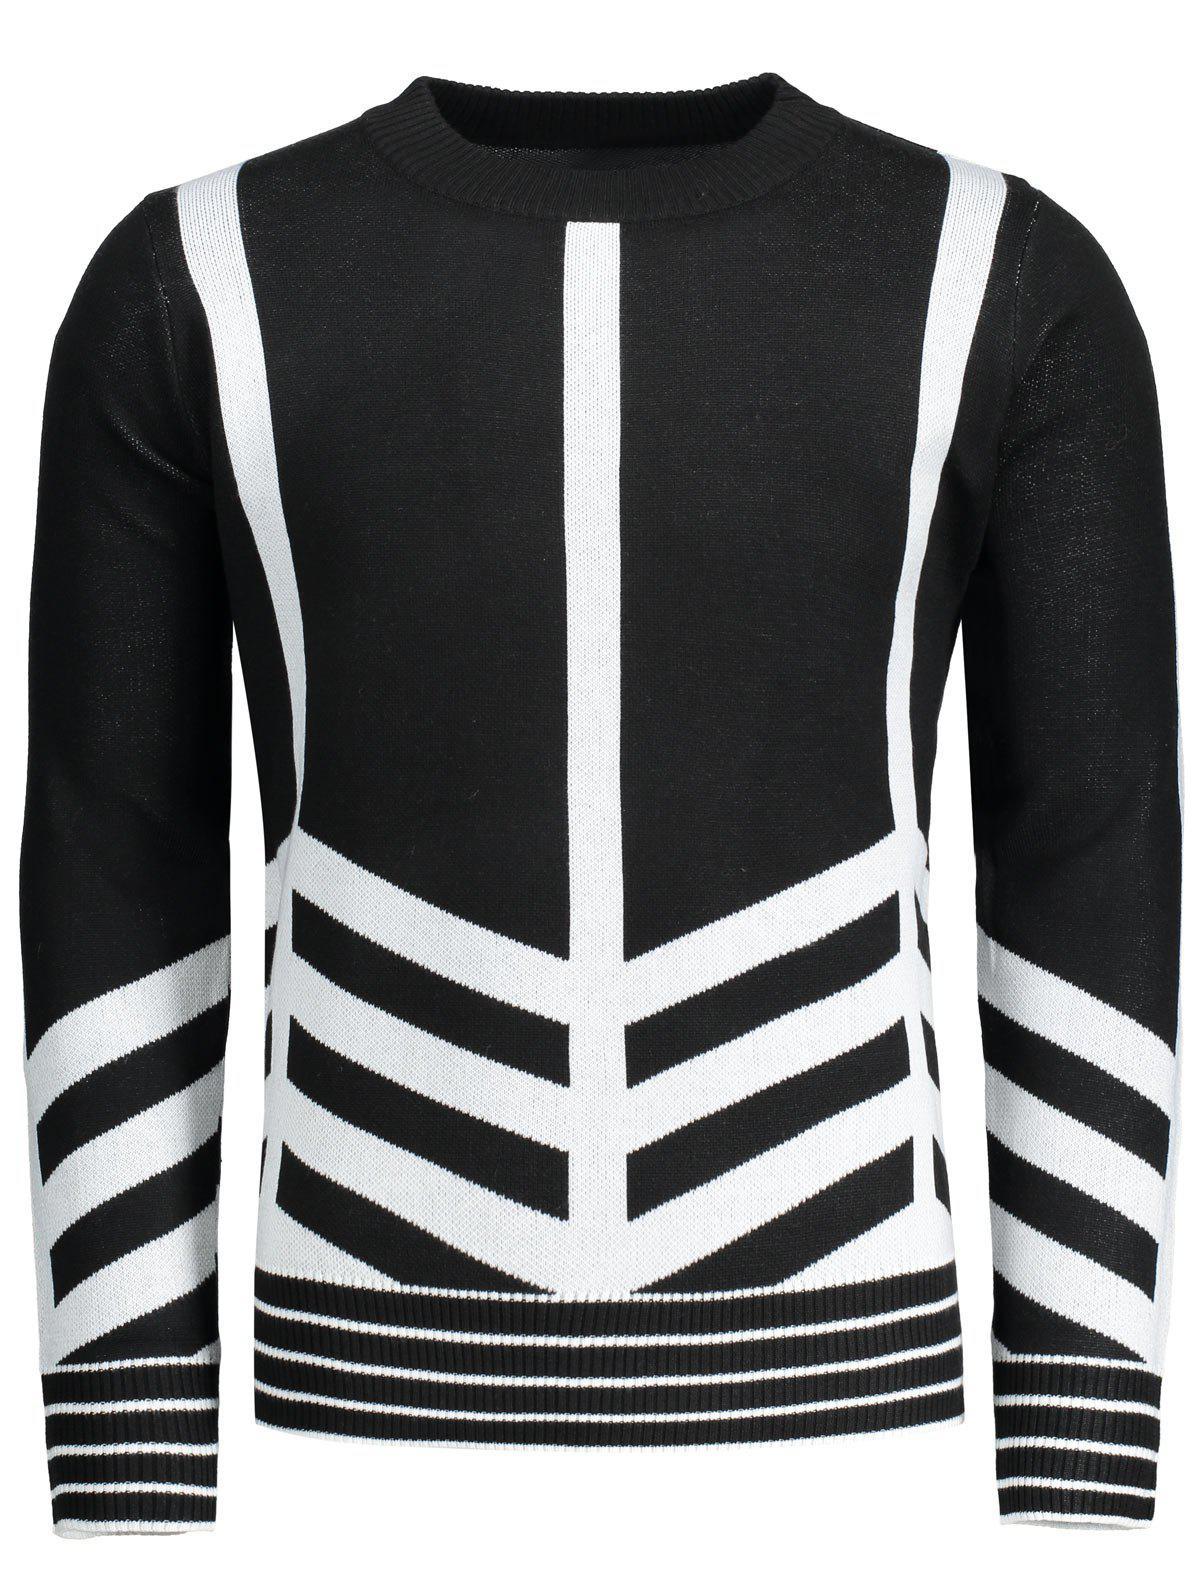 Crew Neck Geometric Patterned Sweater 229901901